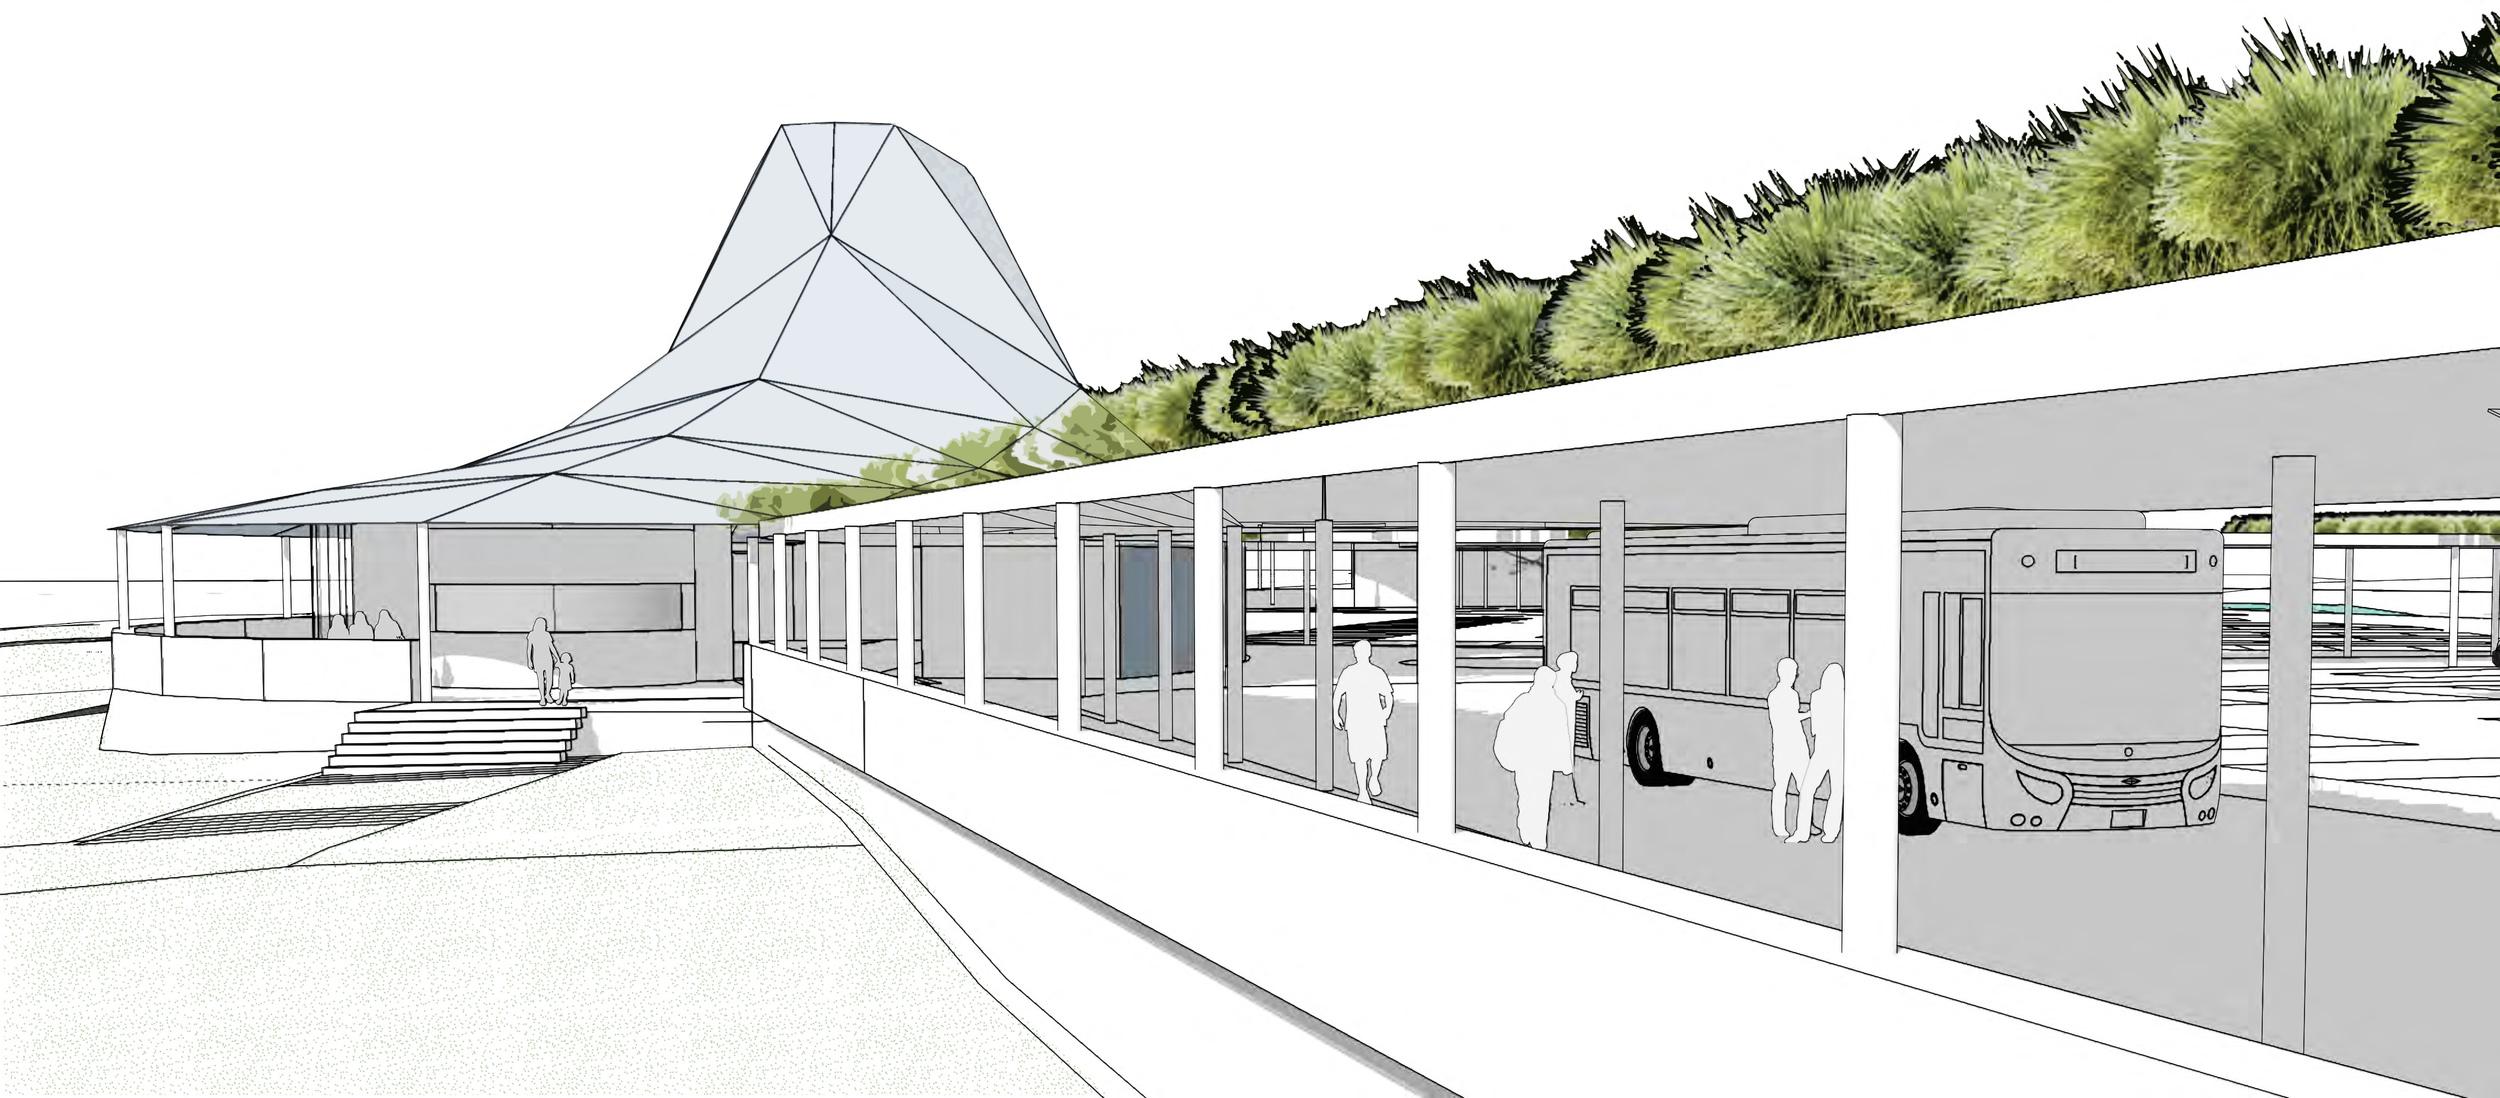 transit hub2.jpg